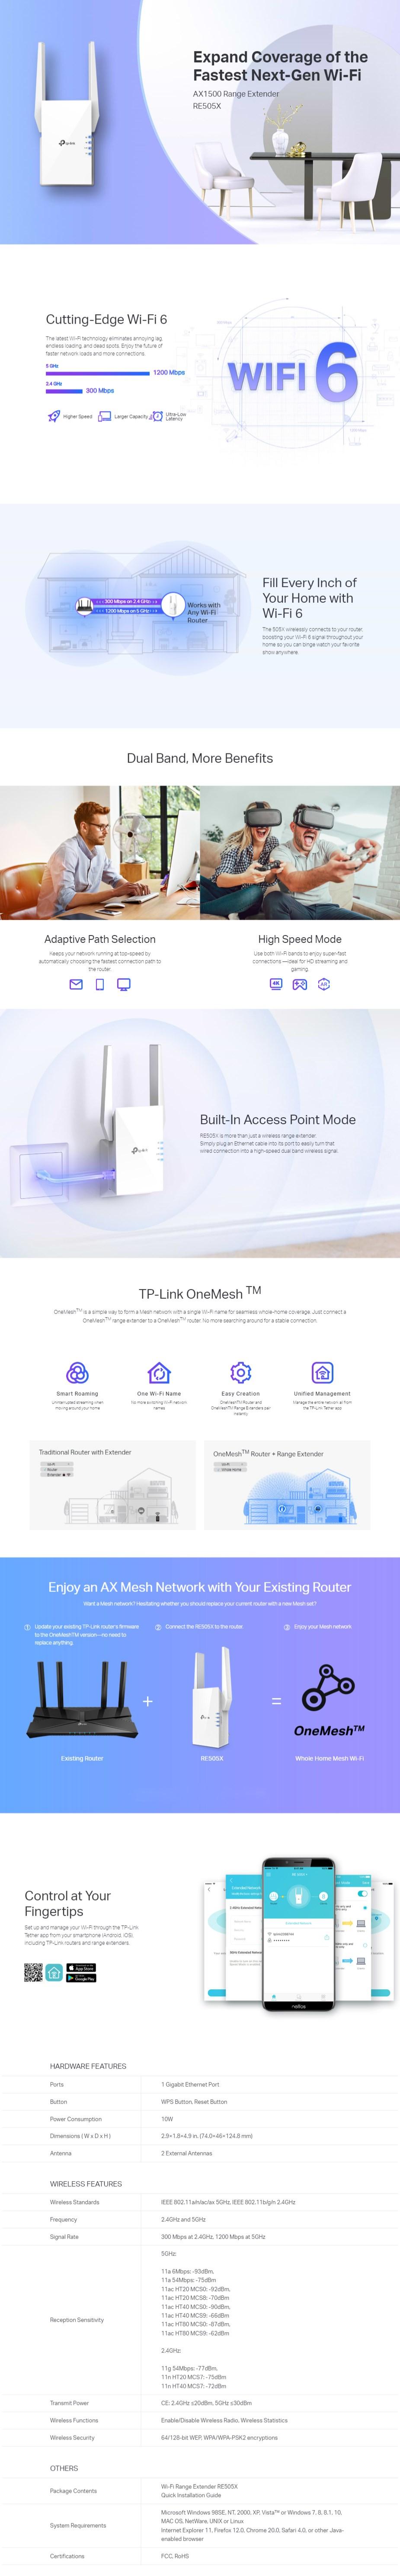 tplink-re505x-ax1500-wifi-range-extender-ac32476-1.jpg